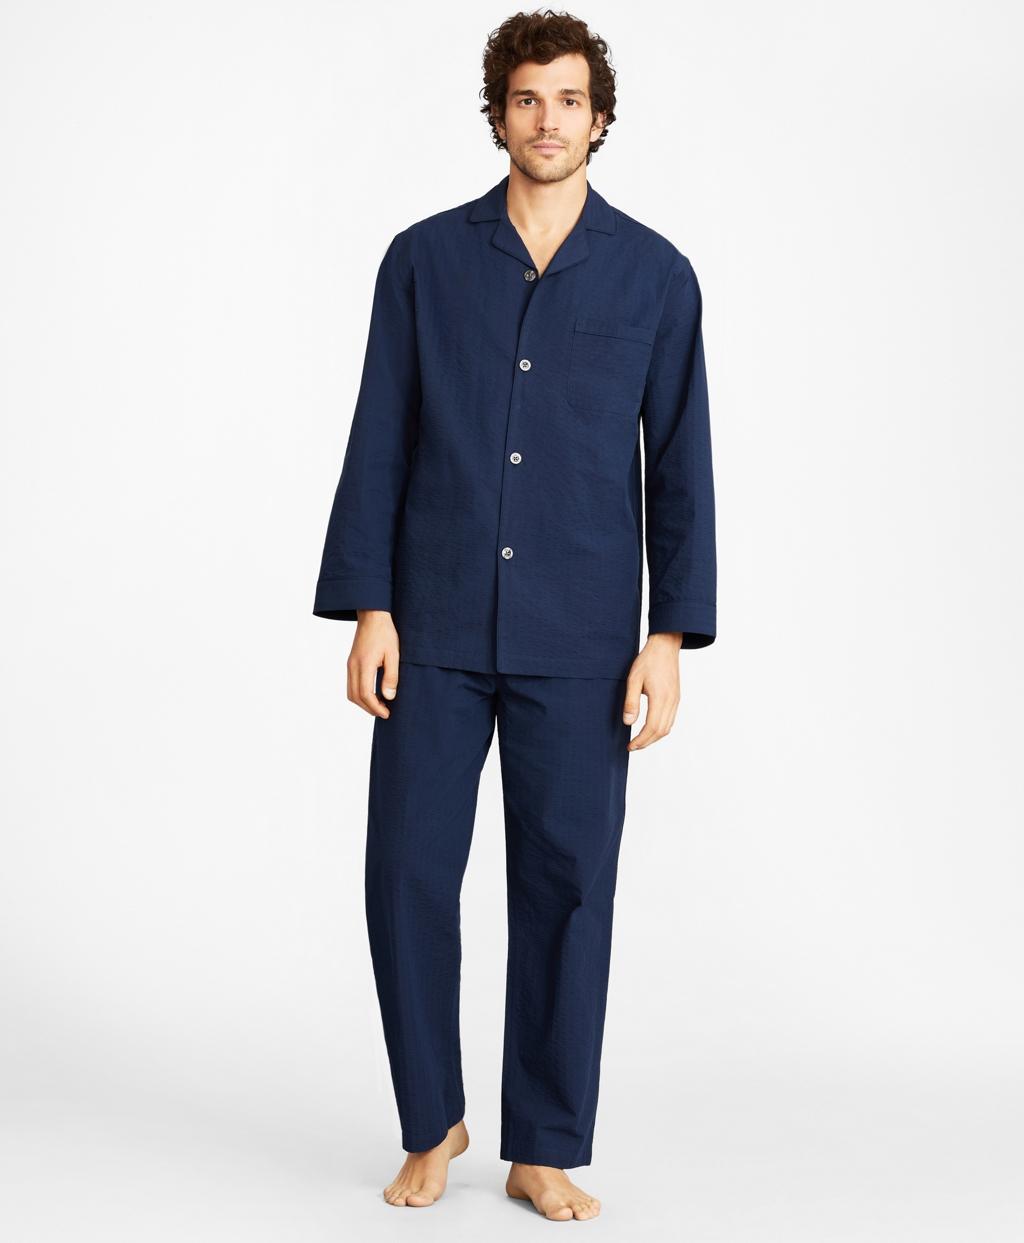 Vintage Men's Underwear Brooks Brothers Mens Seersucker Tonal Stripe Pajamas $98.50 AT vintagedancer.com